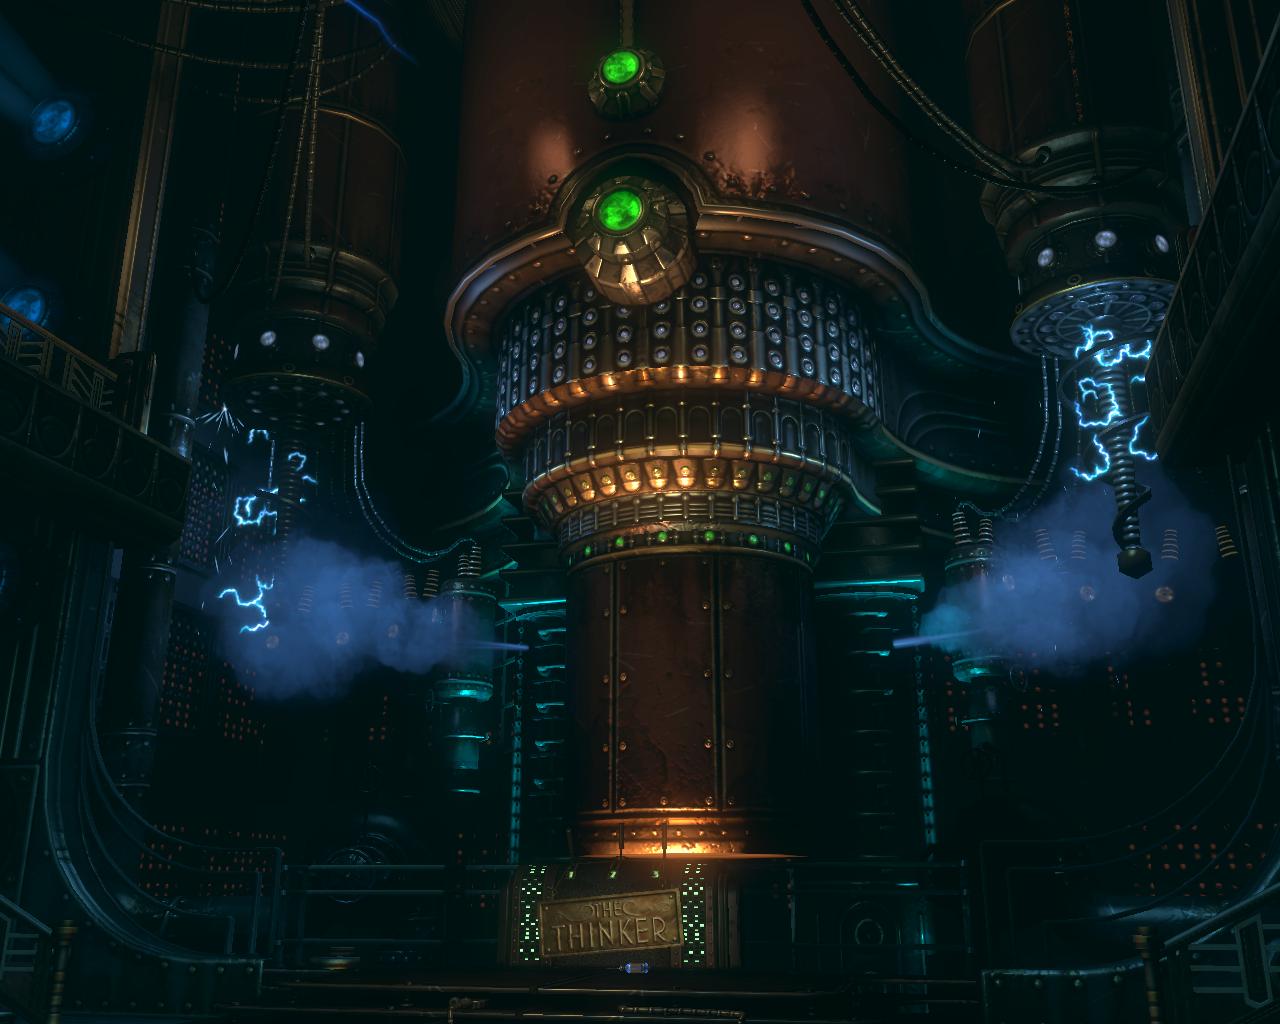 BioShock_2-The_Thinker_-_The_Thinker%27s_Core_f0366.png